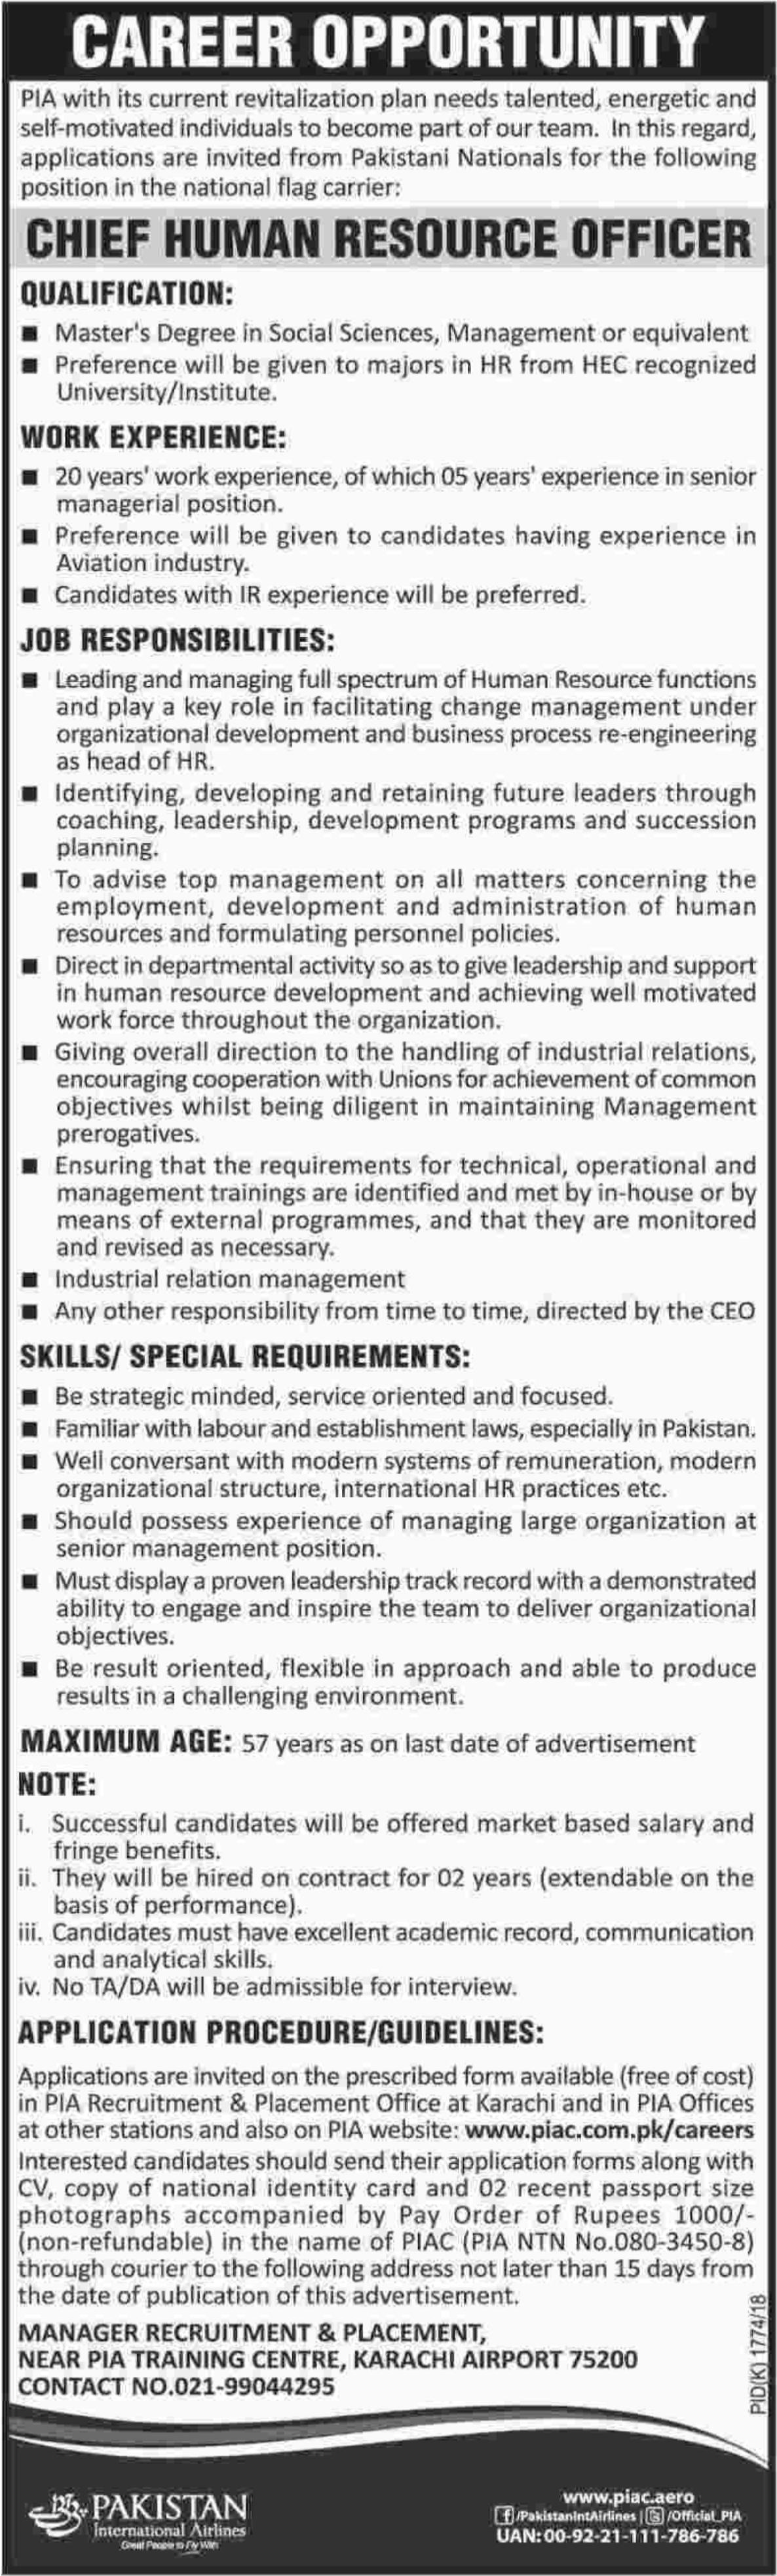 PIA Jobs Pakistan International Airlines Karachi